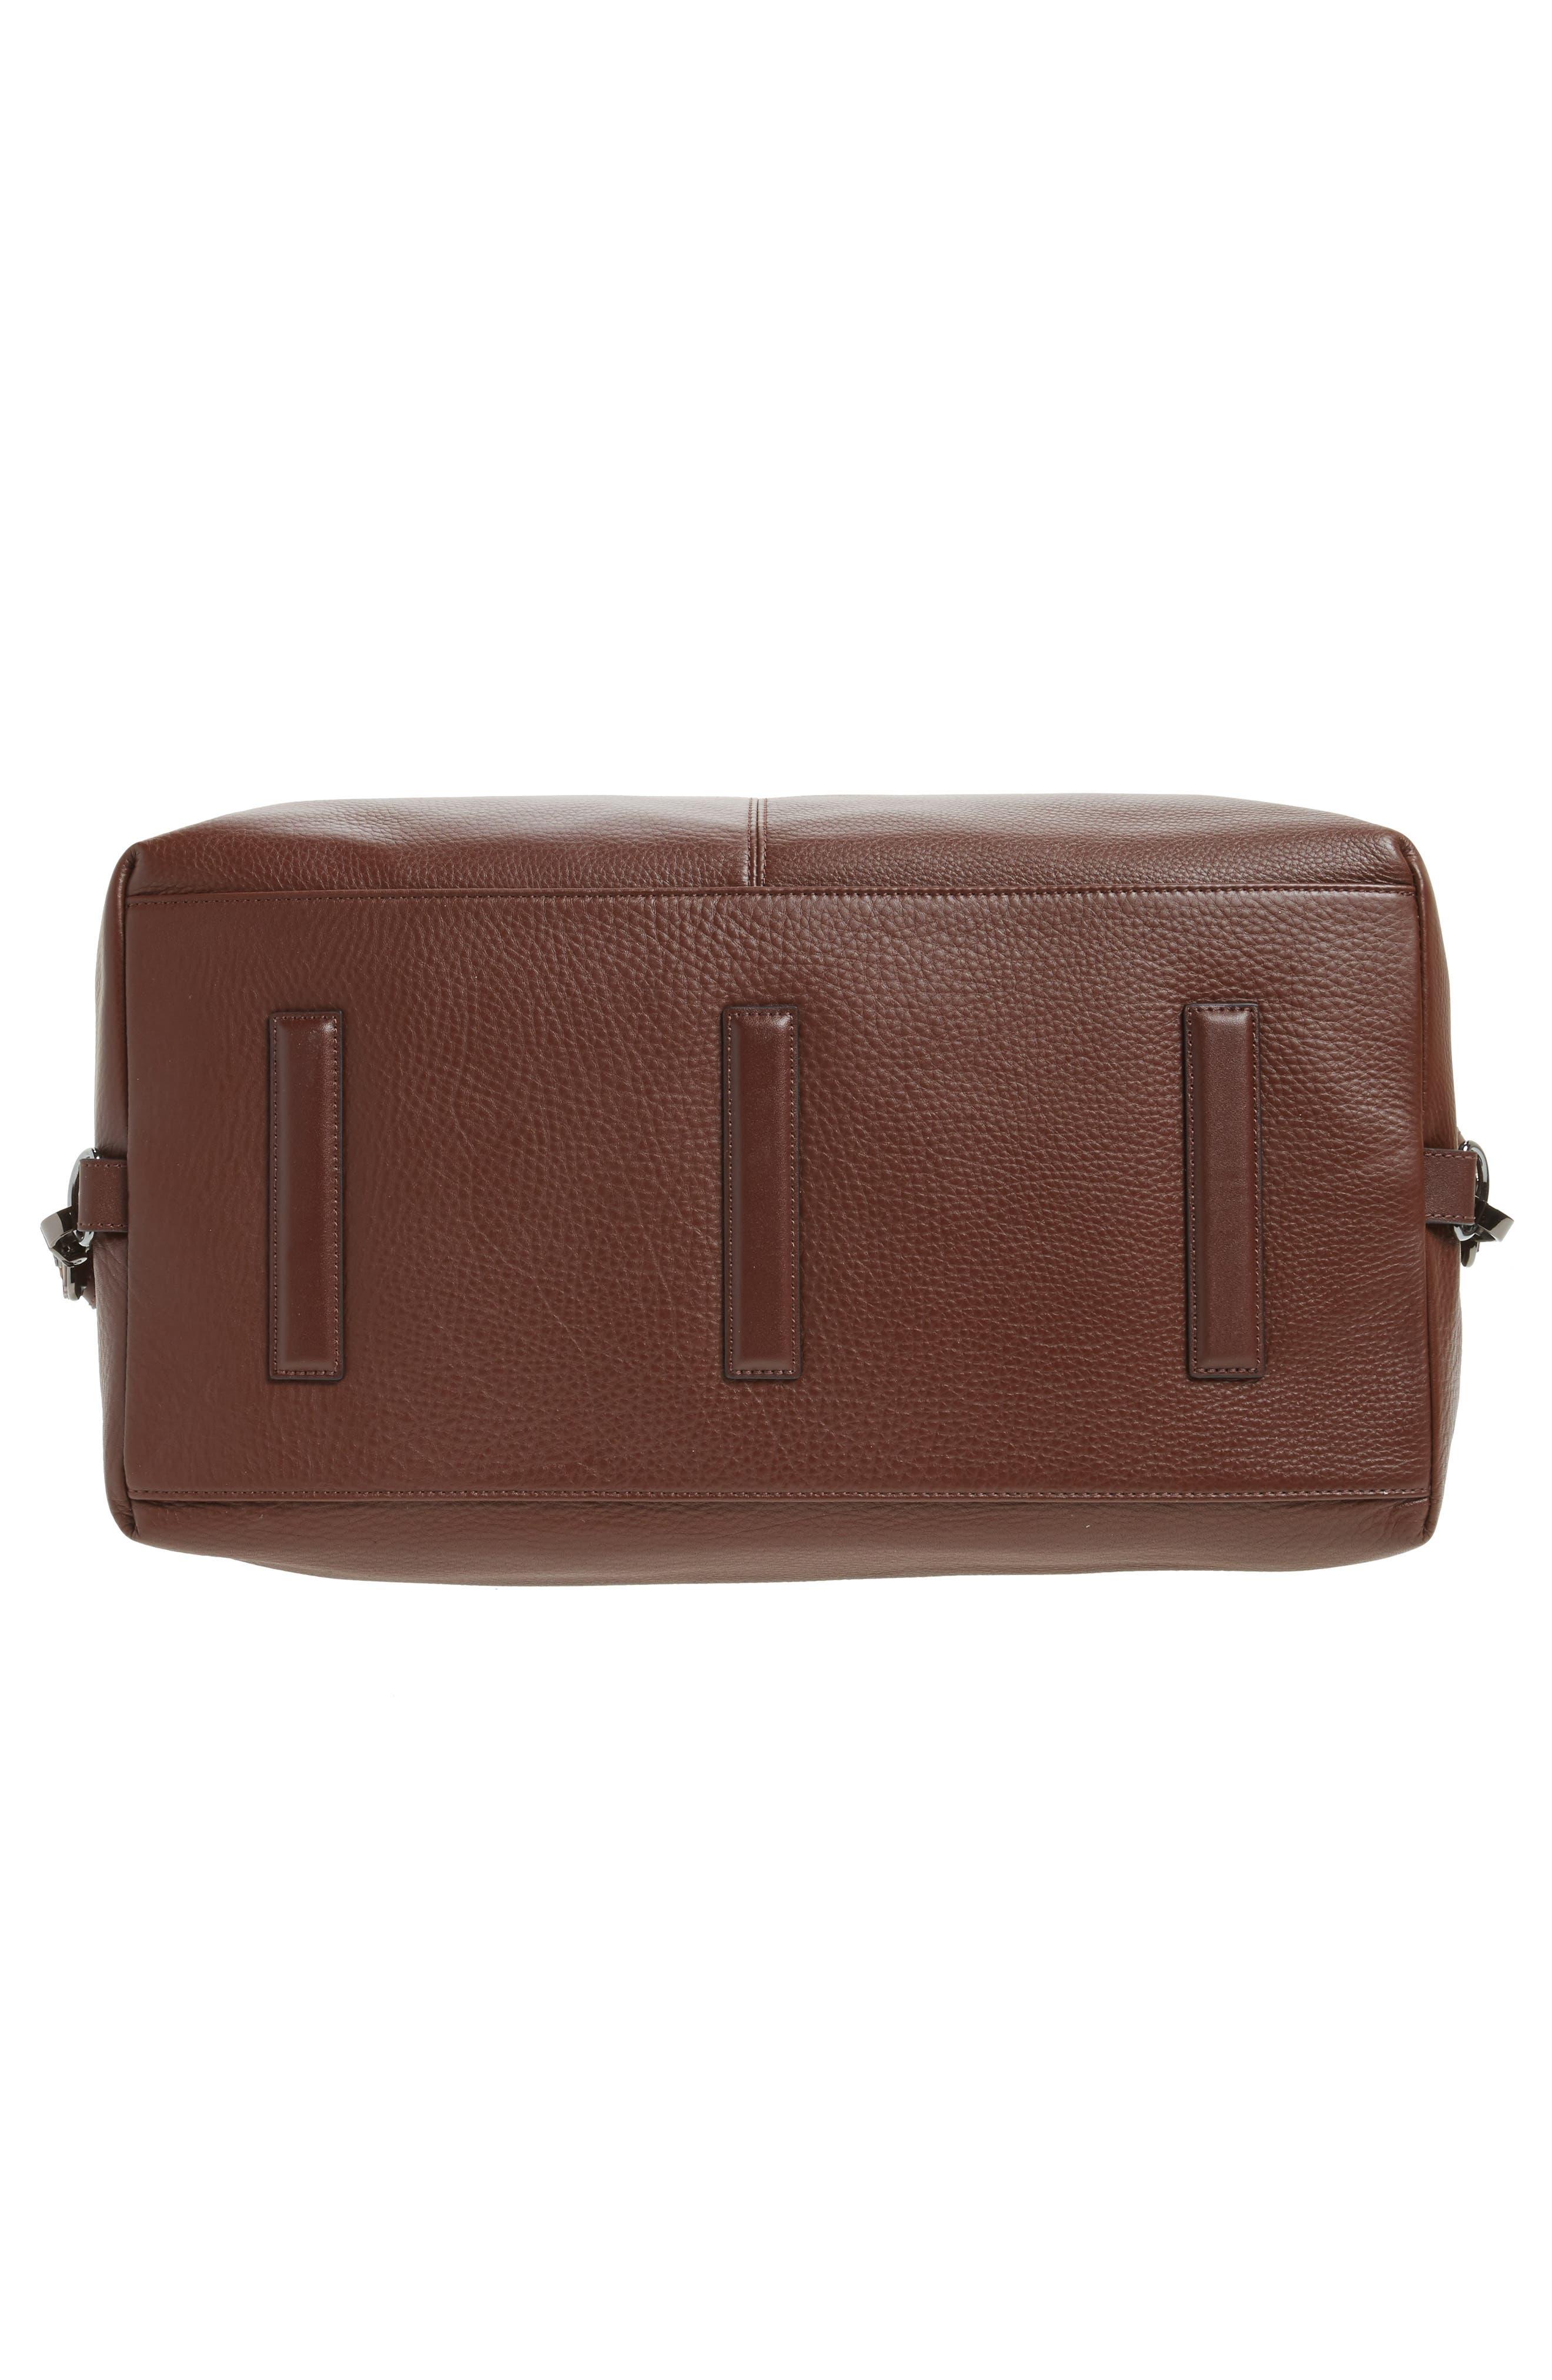 Leather Duffel Bag,                             Alternate thumbnail 6, color,                             217